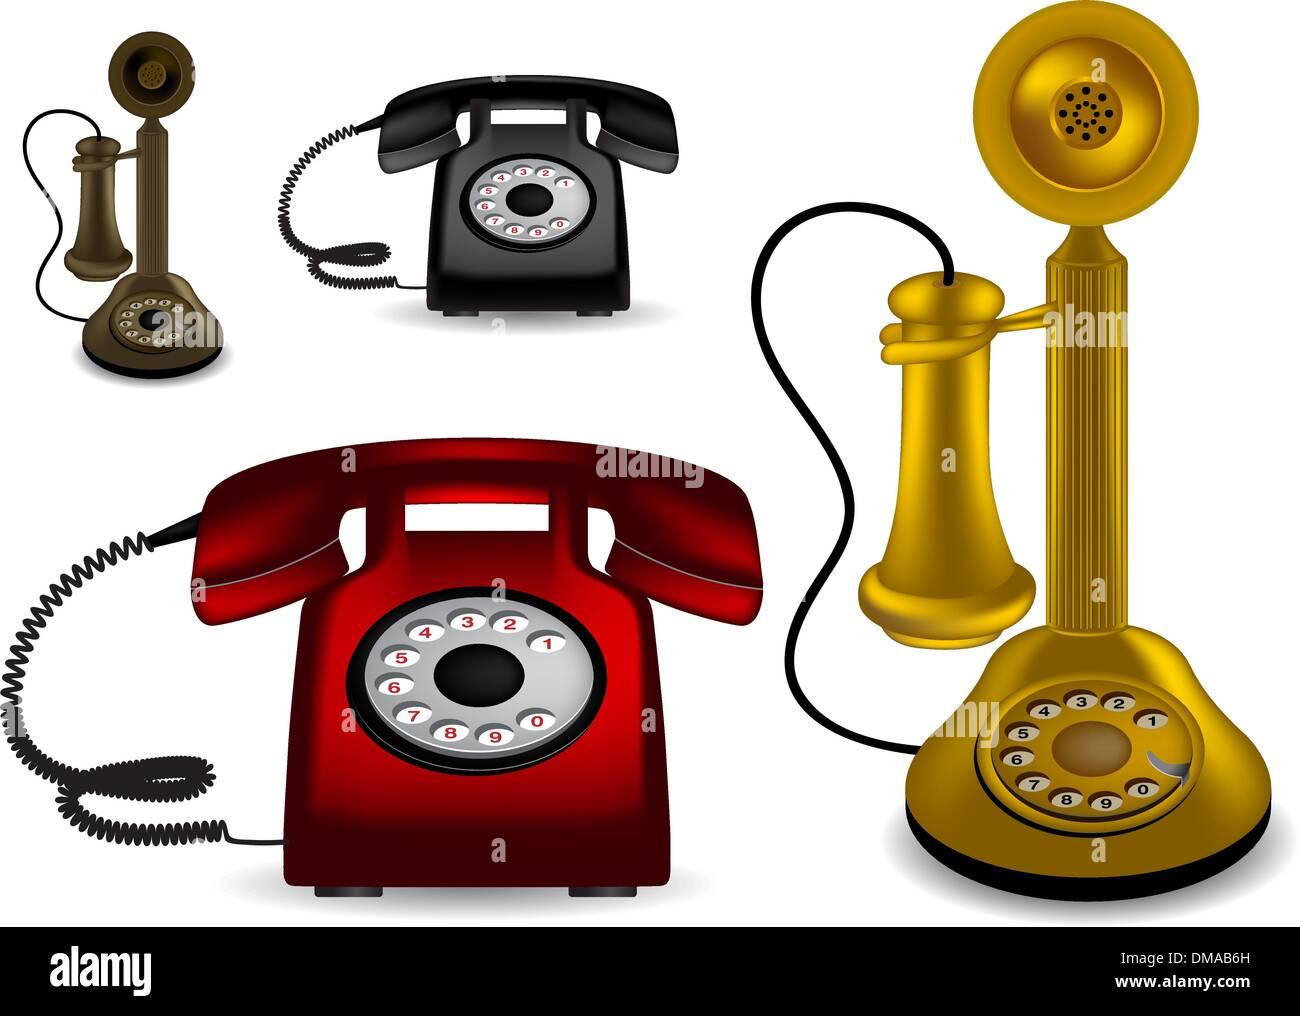 Retro-Telefon - Vektor-illustration Stockbild